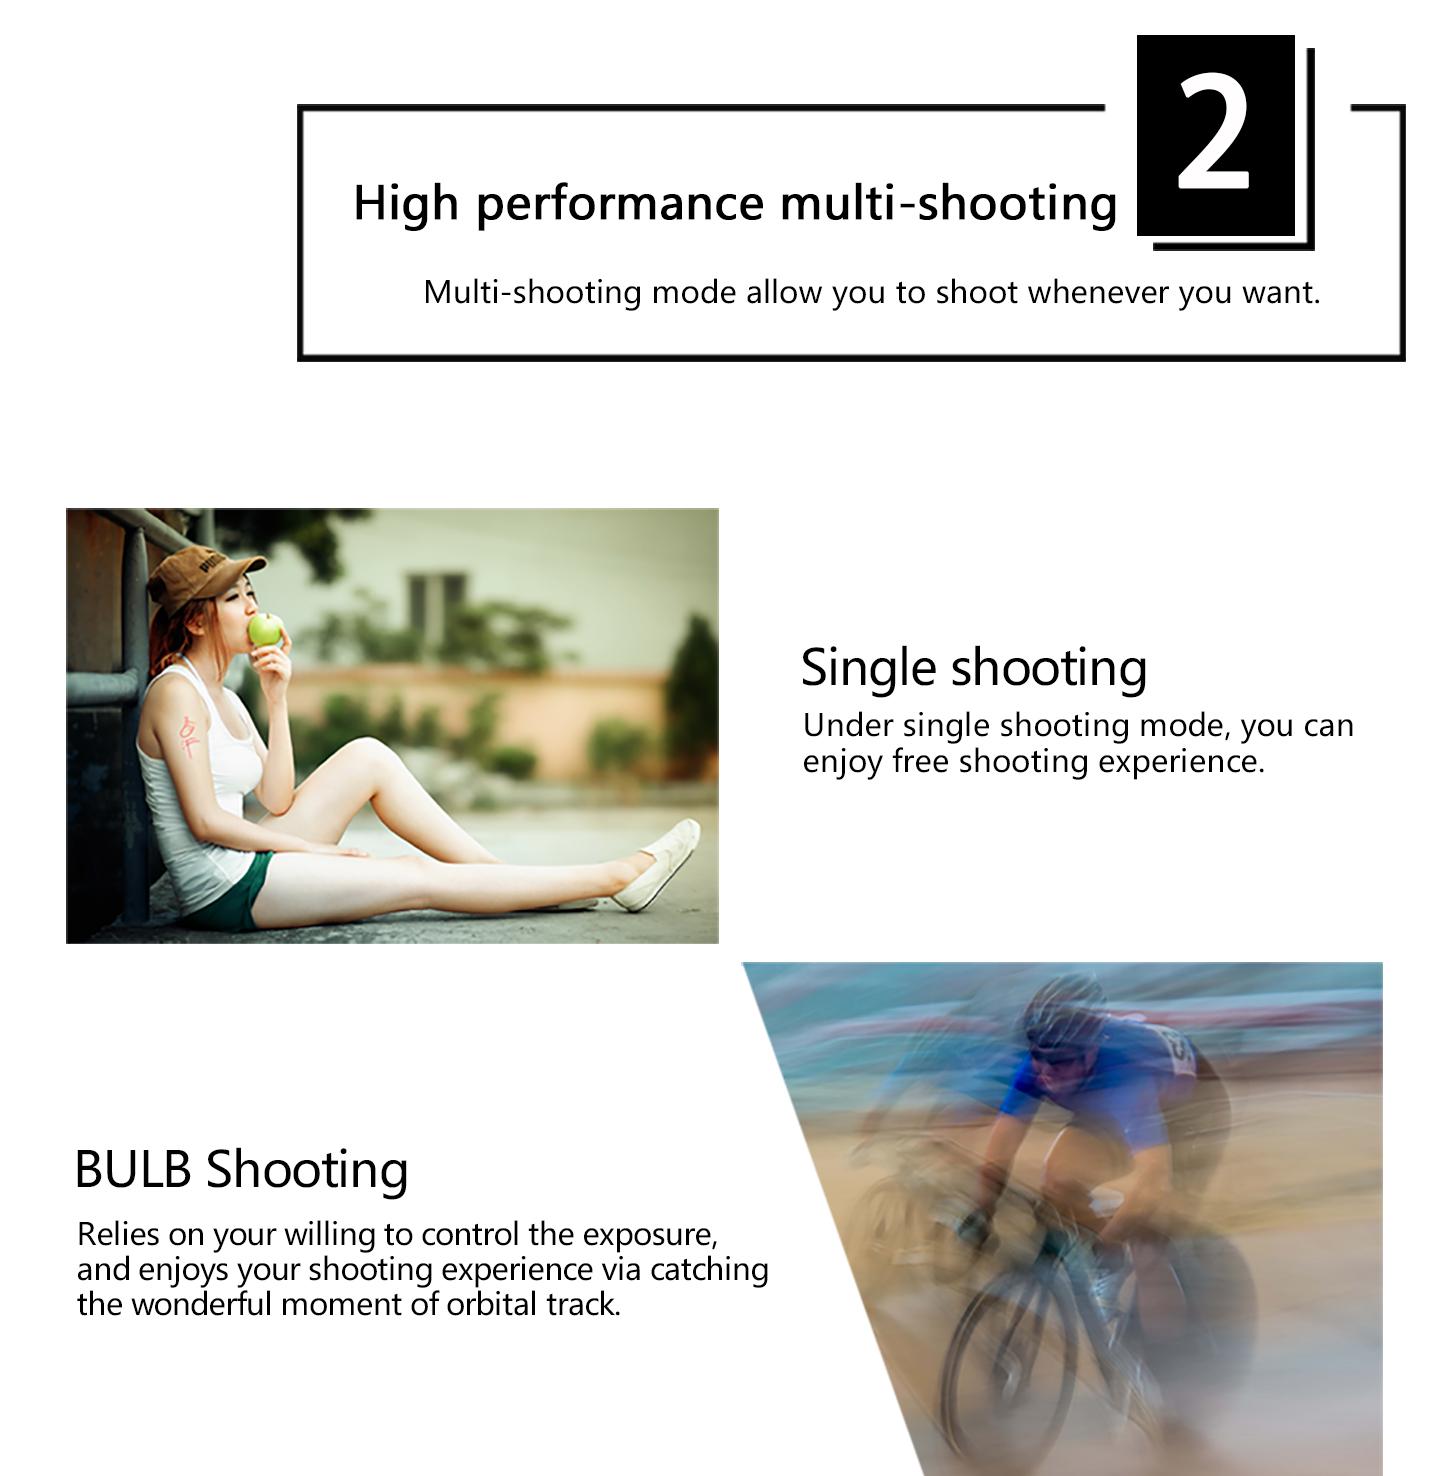 High performance multi-shooting